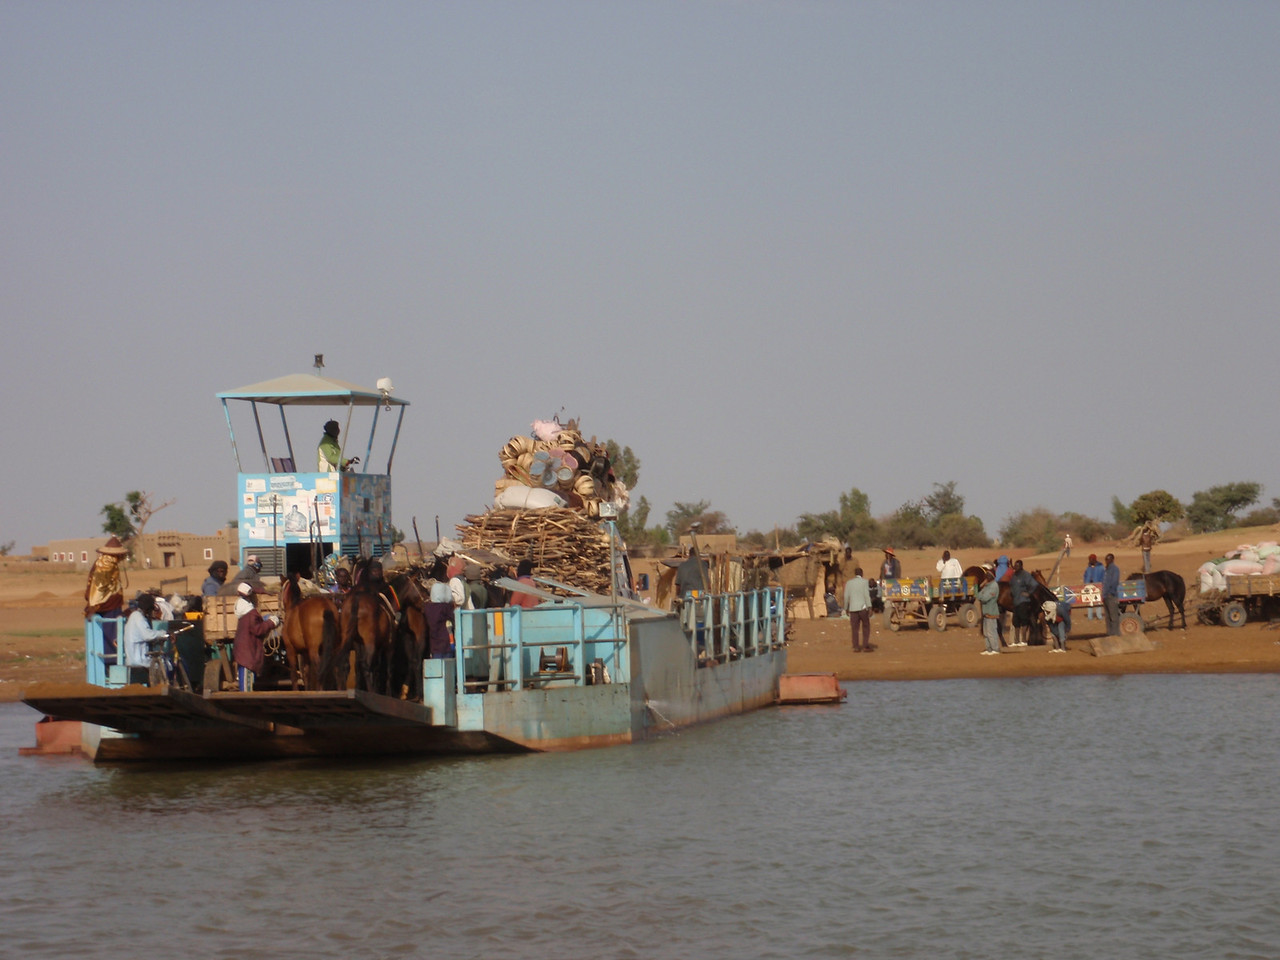 145_Djenne  Built on an Island of the Bani River